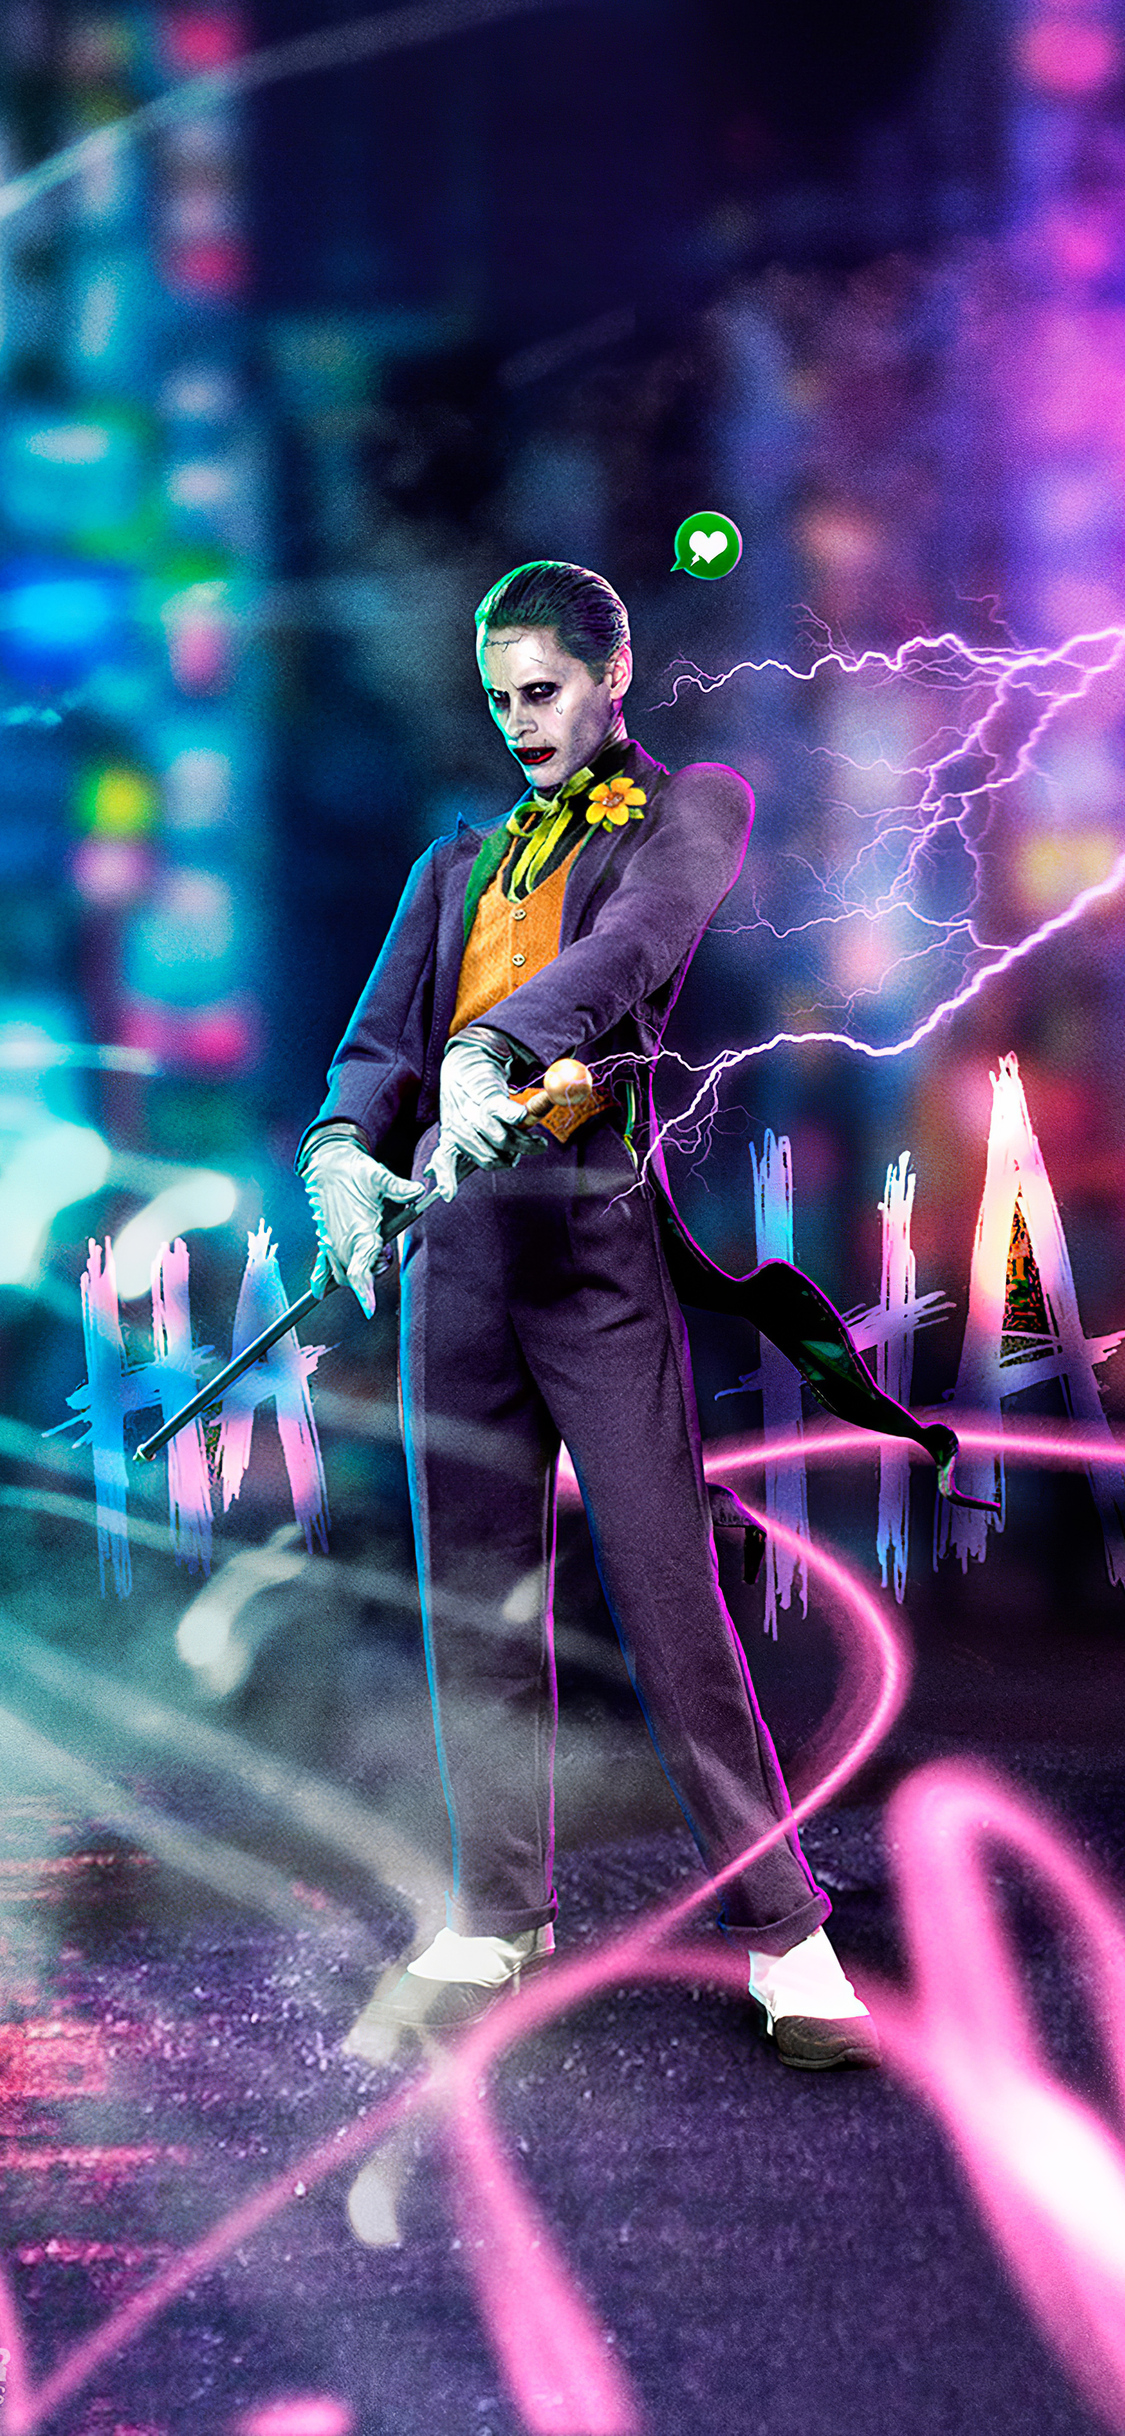 1125x2436 Jared Leto Joker Cyberpunk Art 4k Iphone Xs Iphone 10